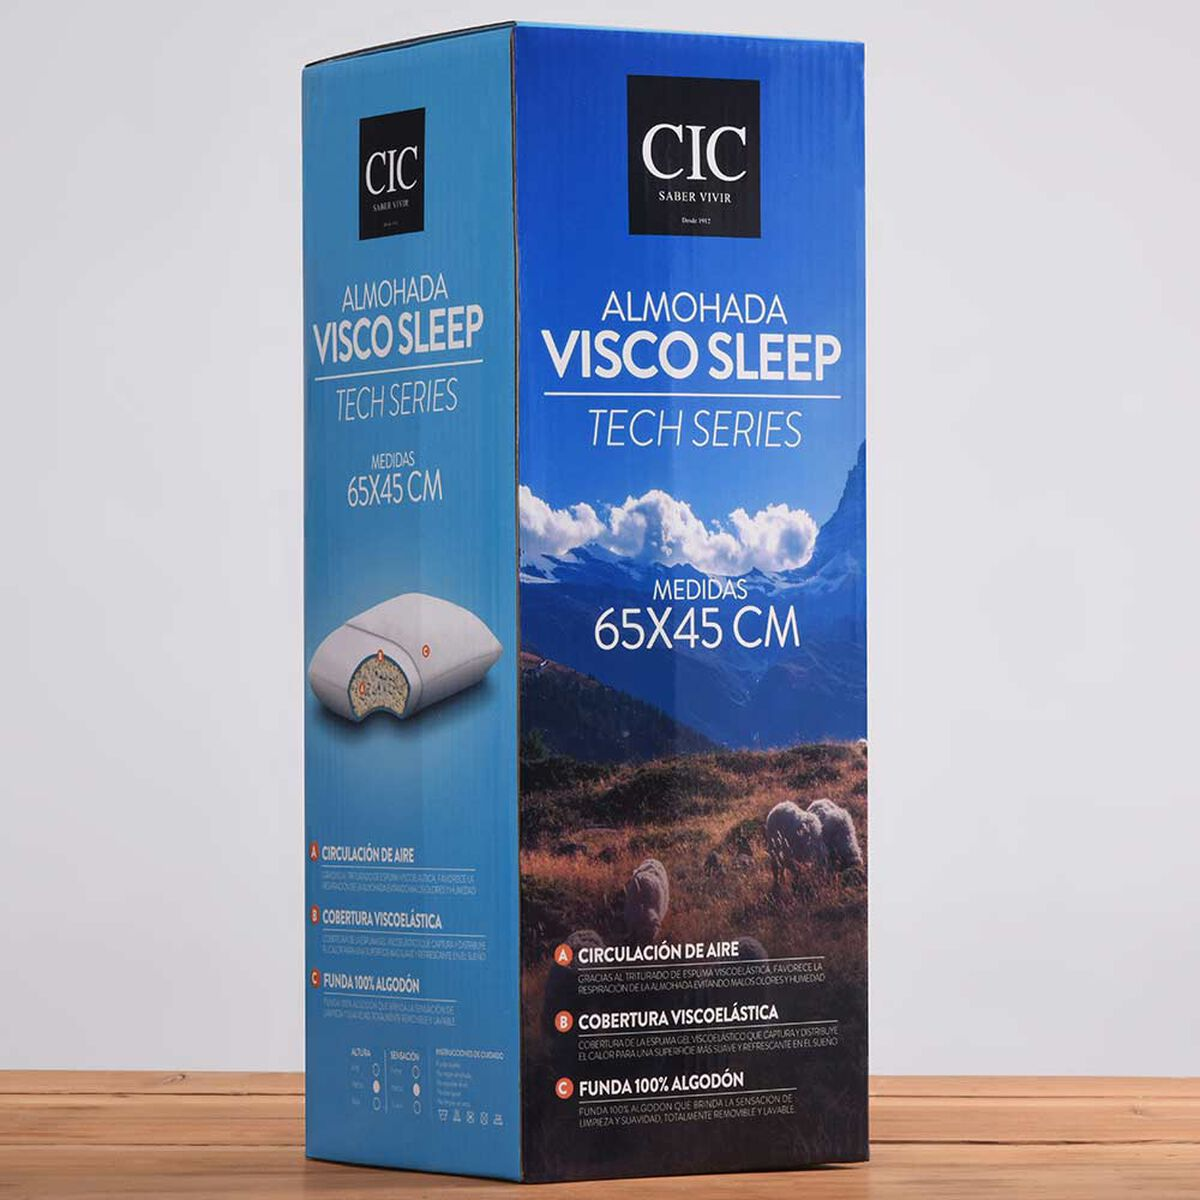 Almohada Viscoelástica Visco Sleep 65x45 cm